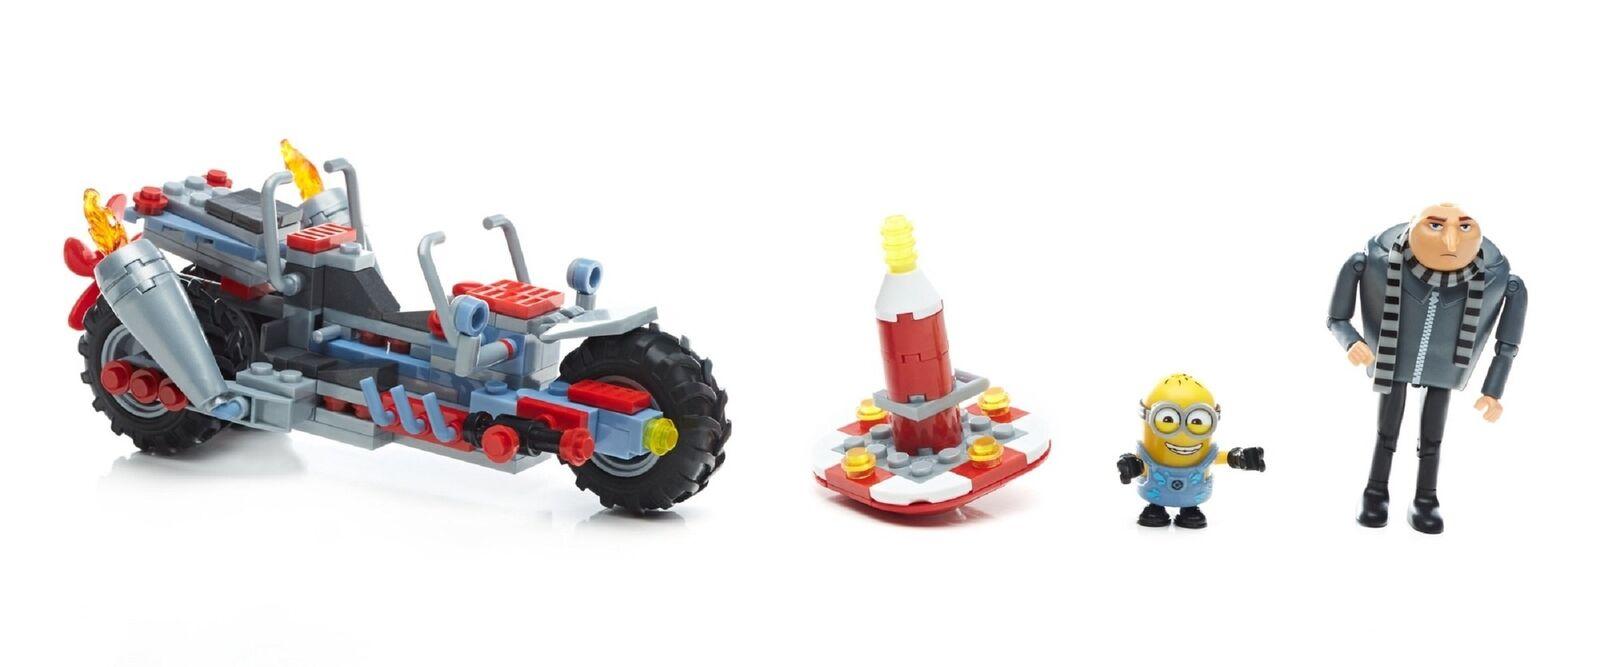 Mega Construx FDX82 Despicable Me 3 Minions Gru's Motorcycle